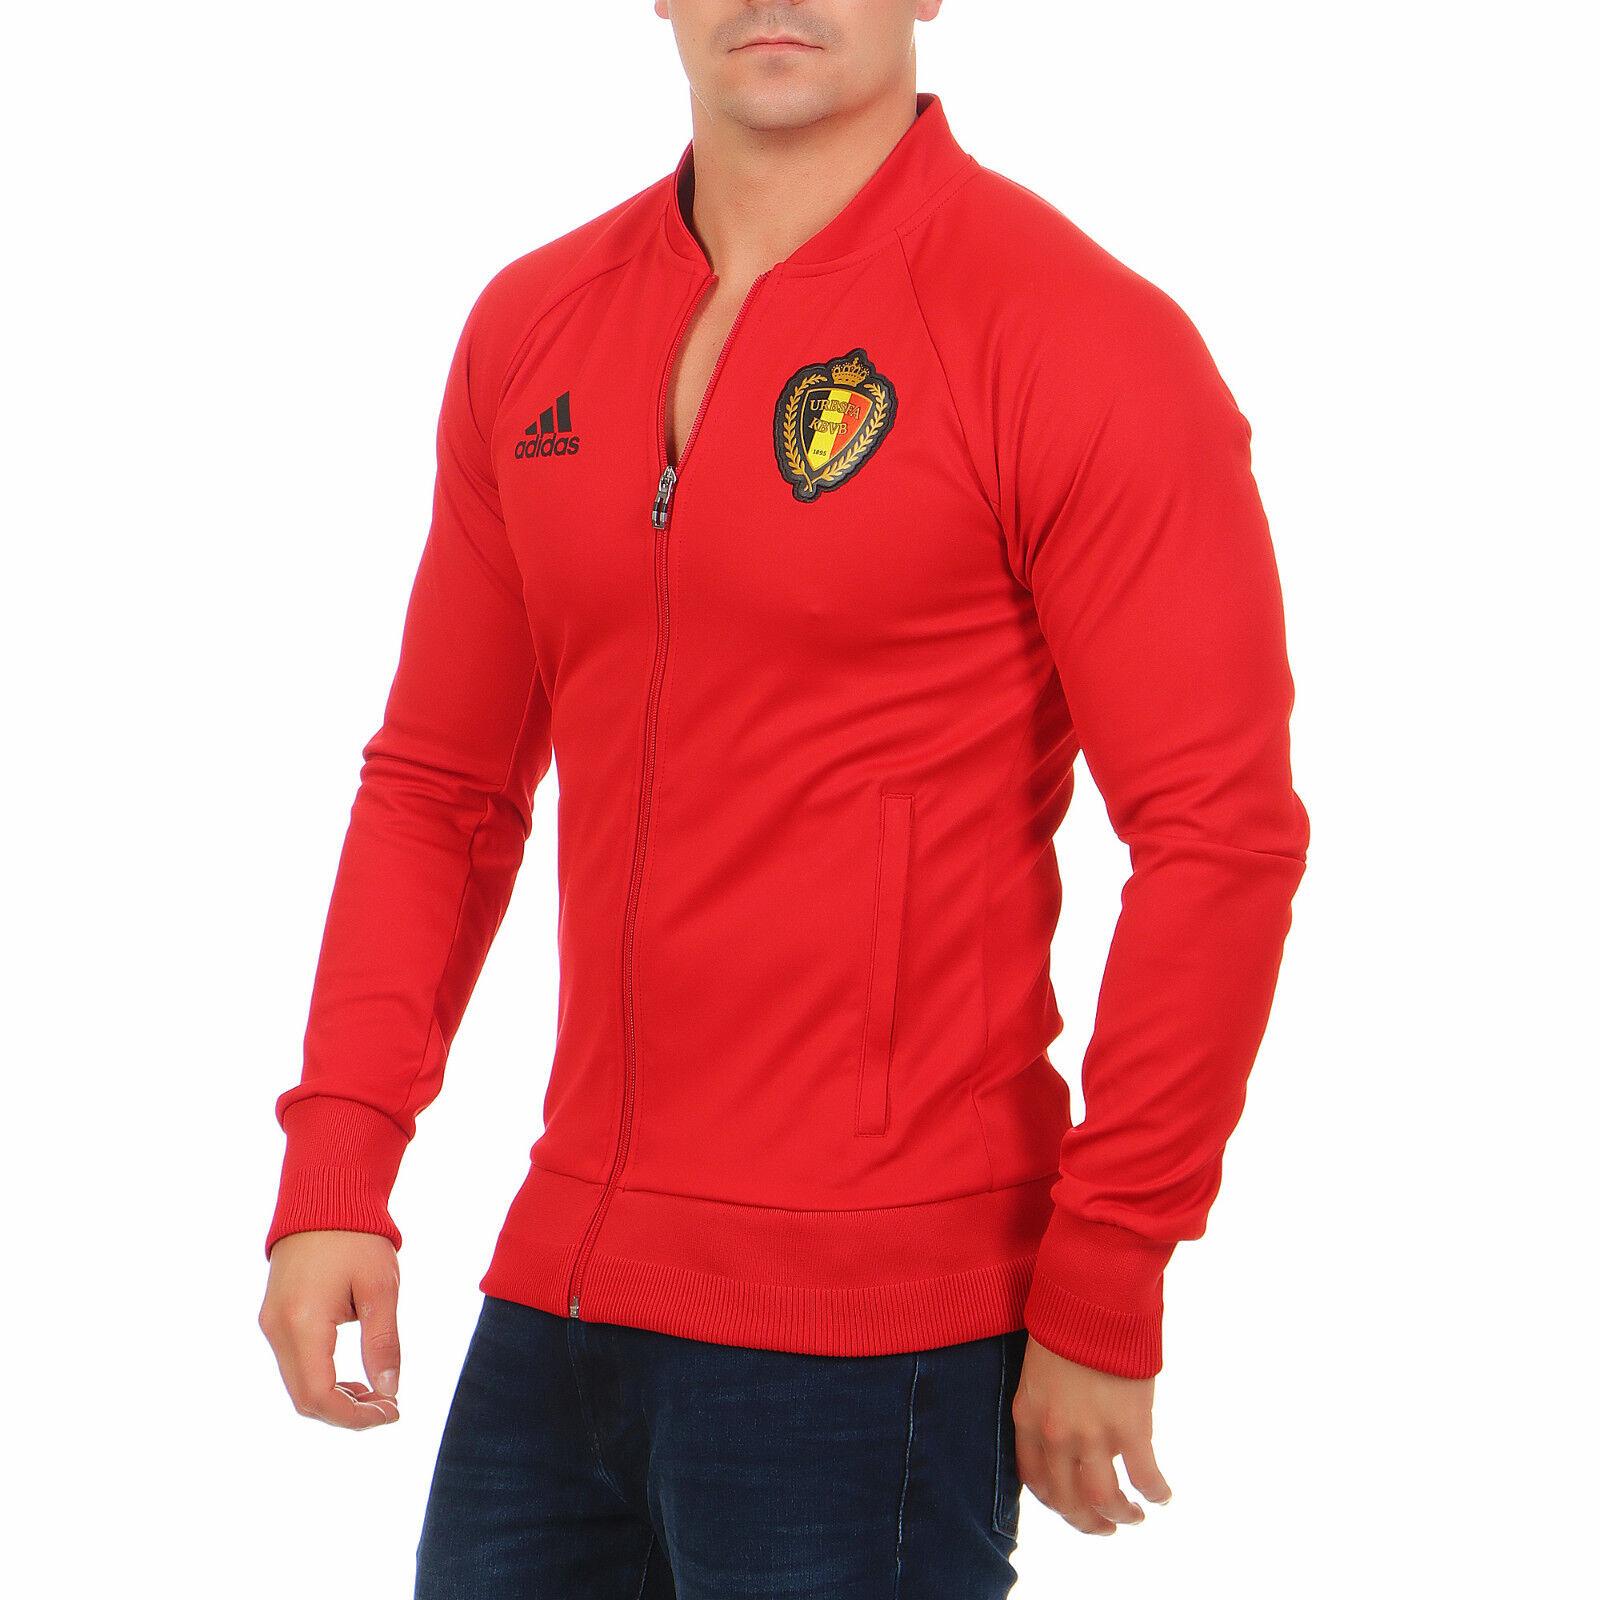 Adidas Belgium Herren AC5818 Anthem Jacke Fussball Sport Trainingsjacke S M L